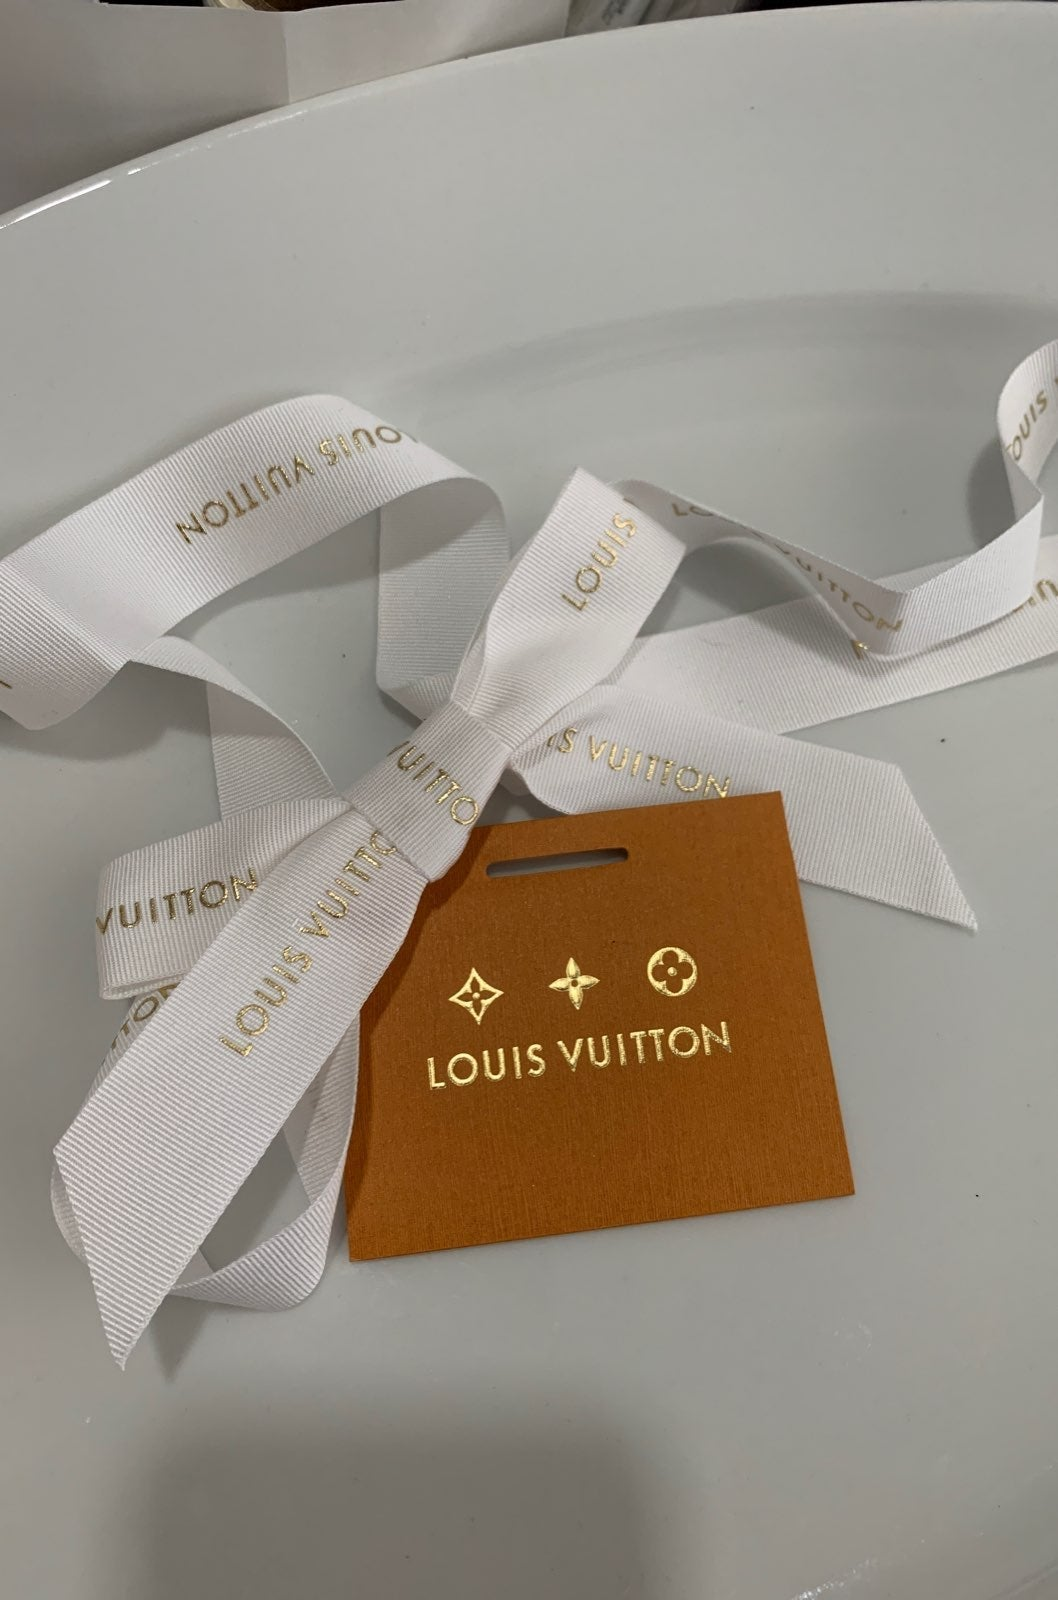 Louis vuitton holiday ribbon gift tag se